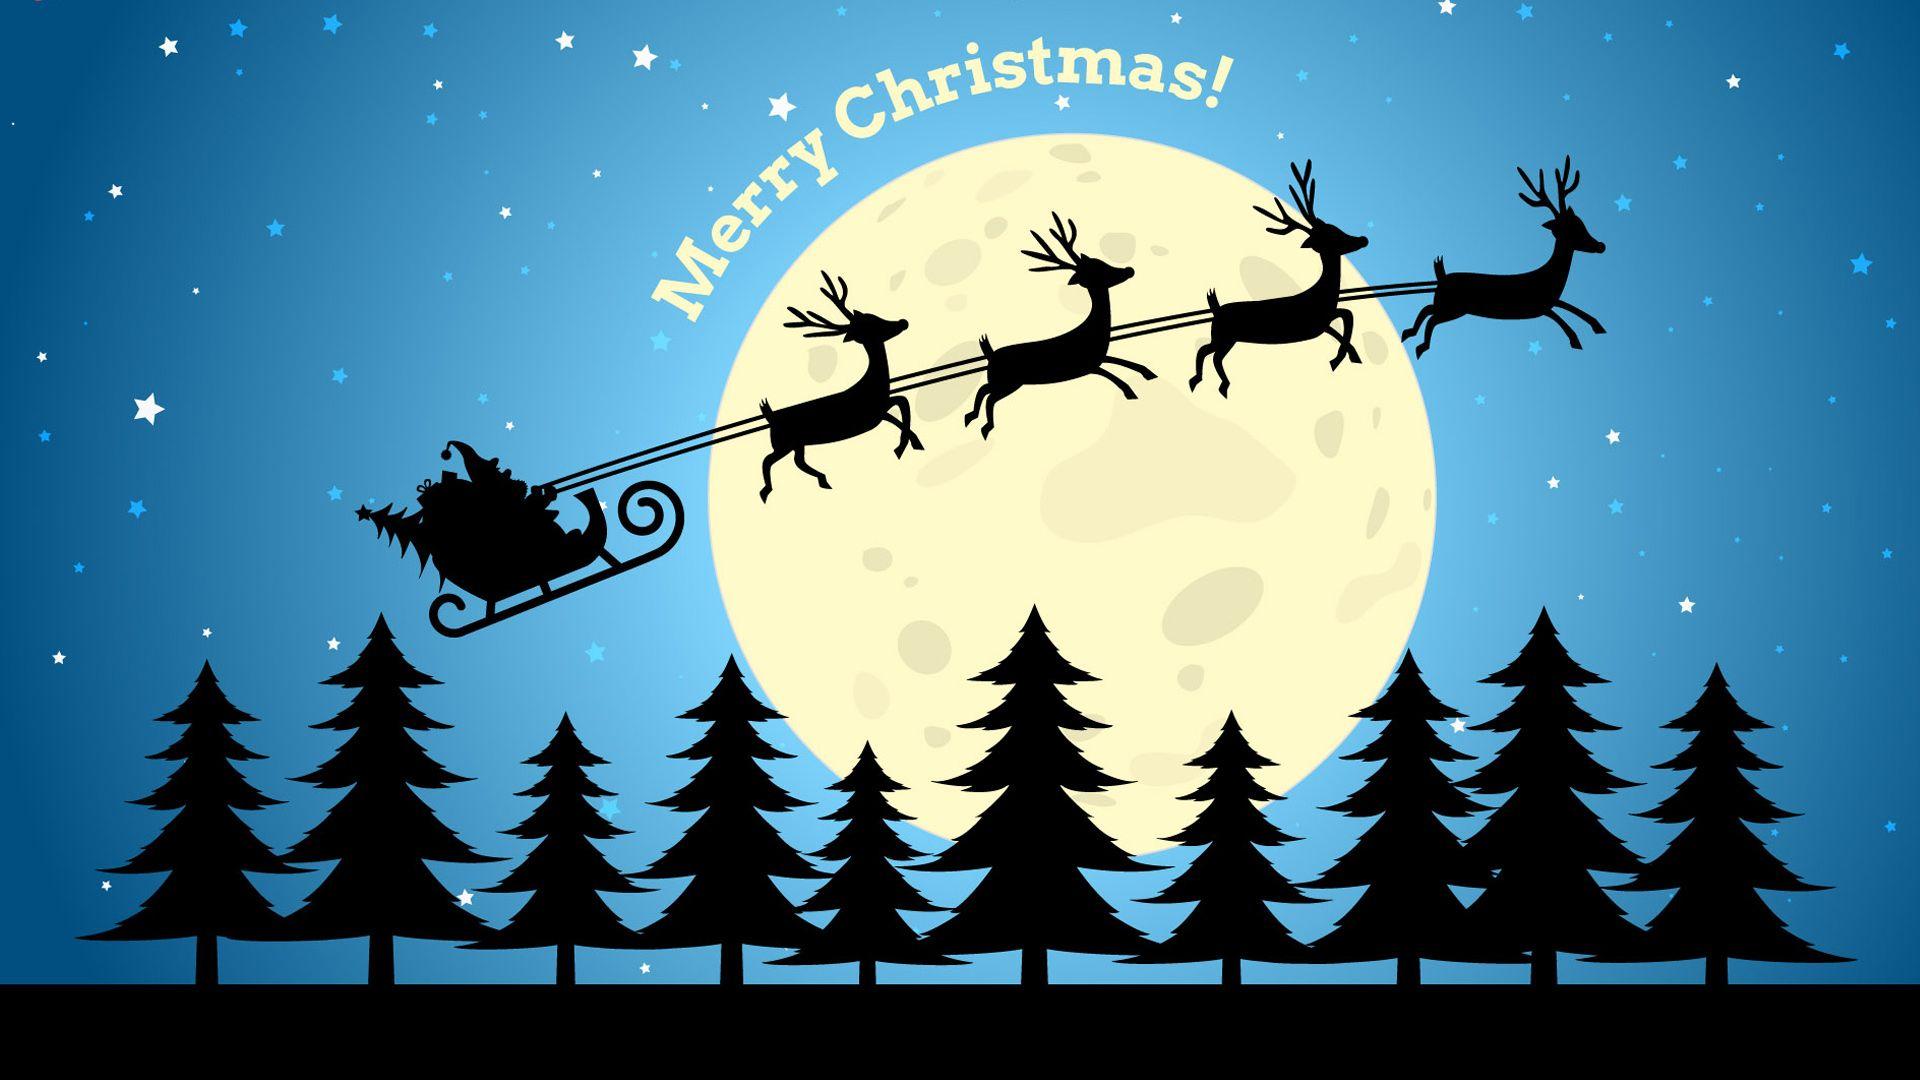 Merry Christmas 2013 Hd Jpg 1920 1080 Merry Christmas Wallpaper Merry Christmas Quotes Merry Christmas Images